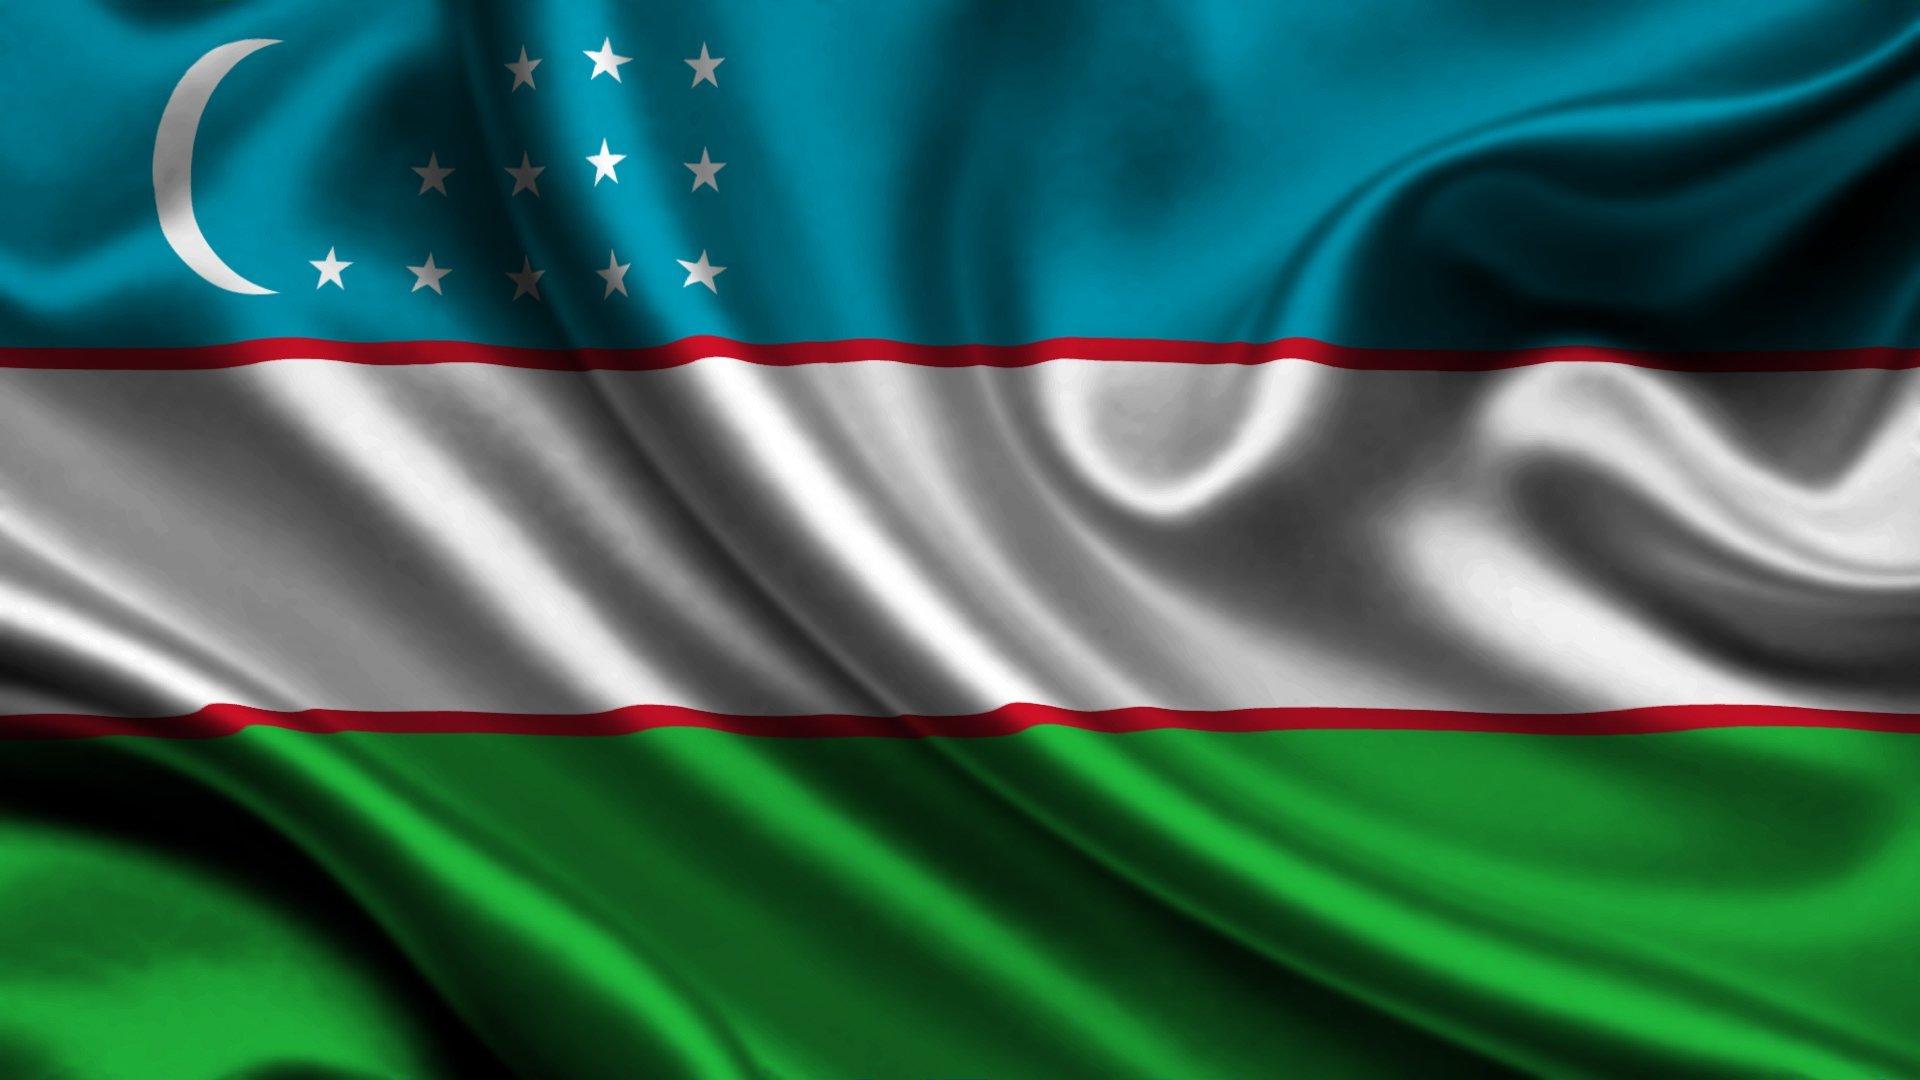 uzbekistan flag HD wallpaper 1920x1080